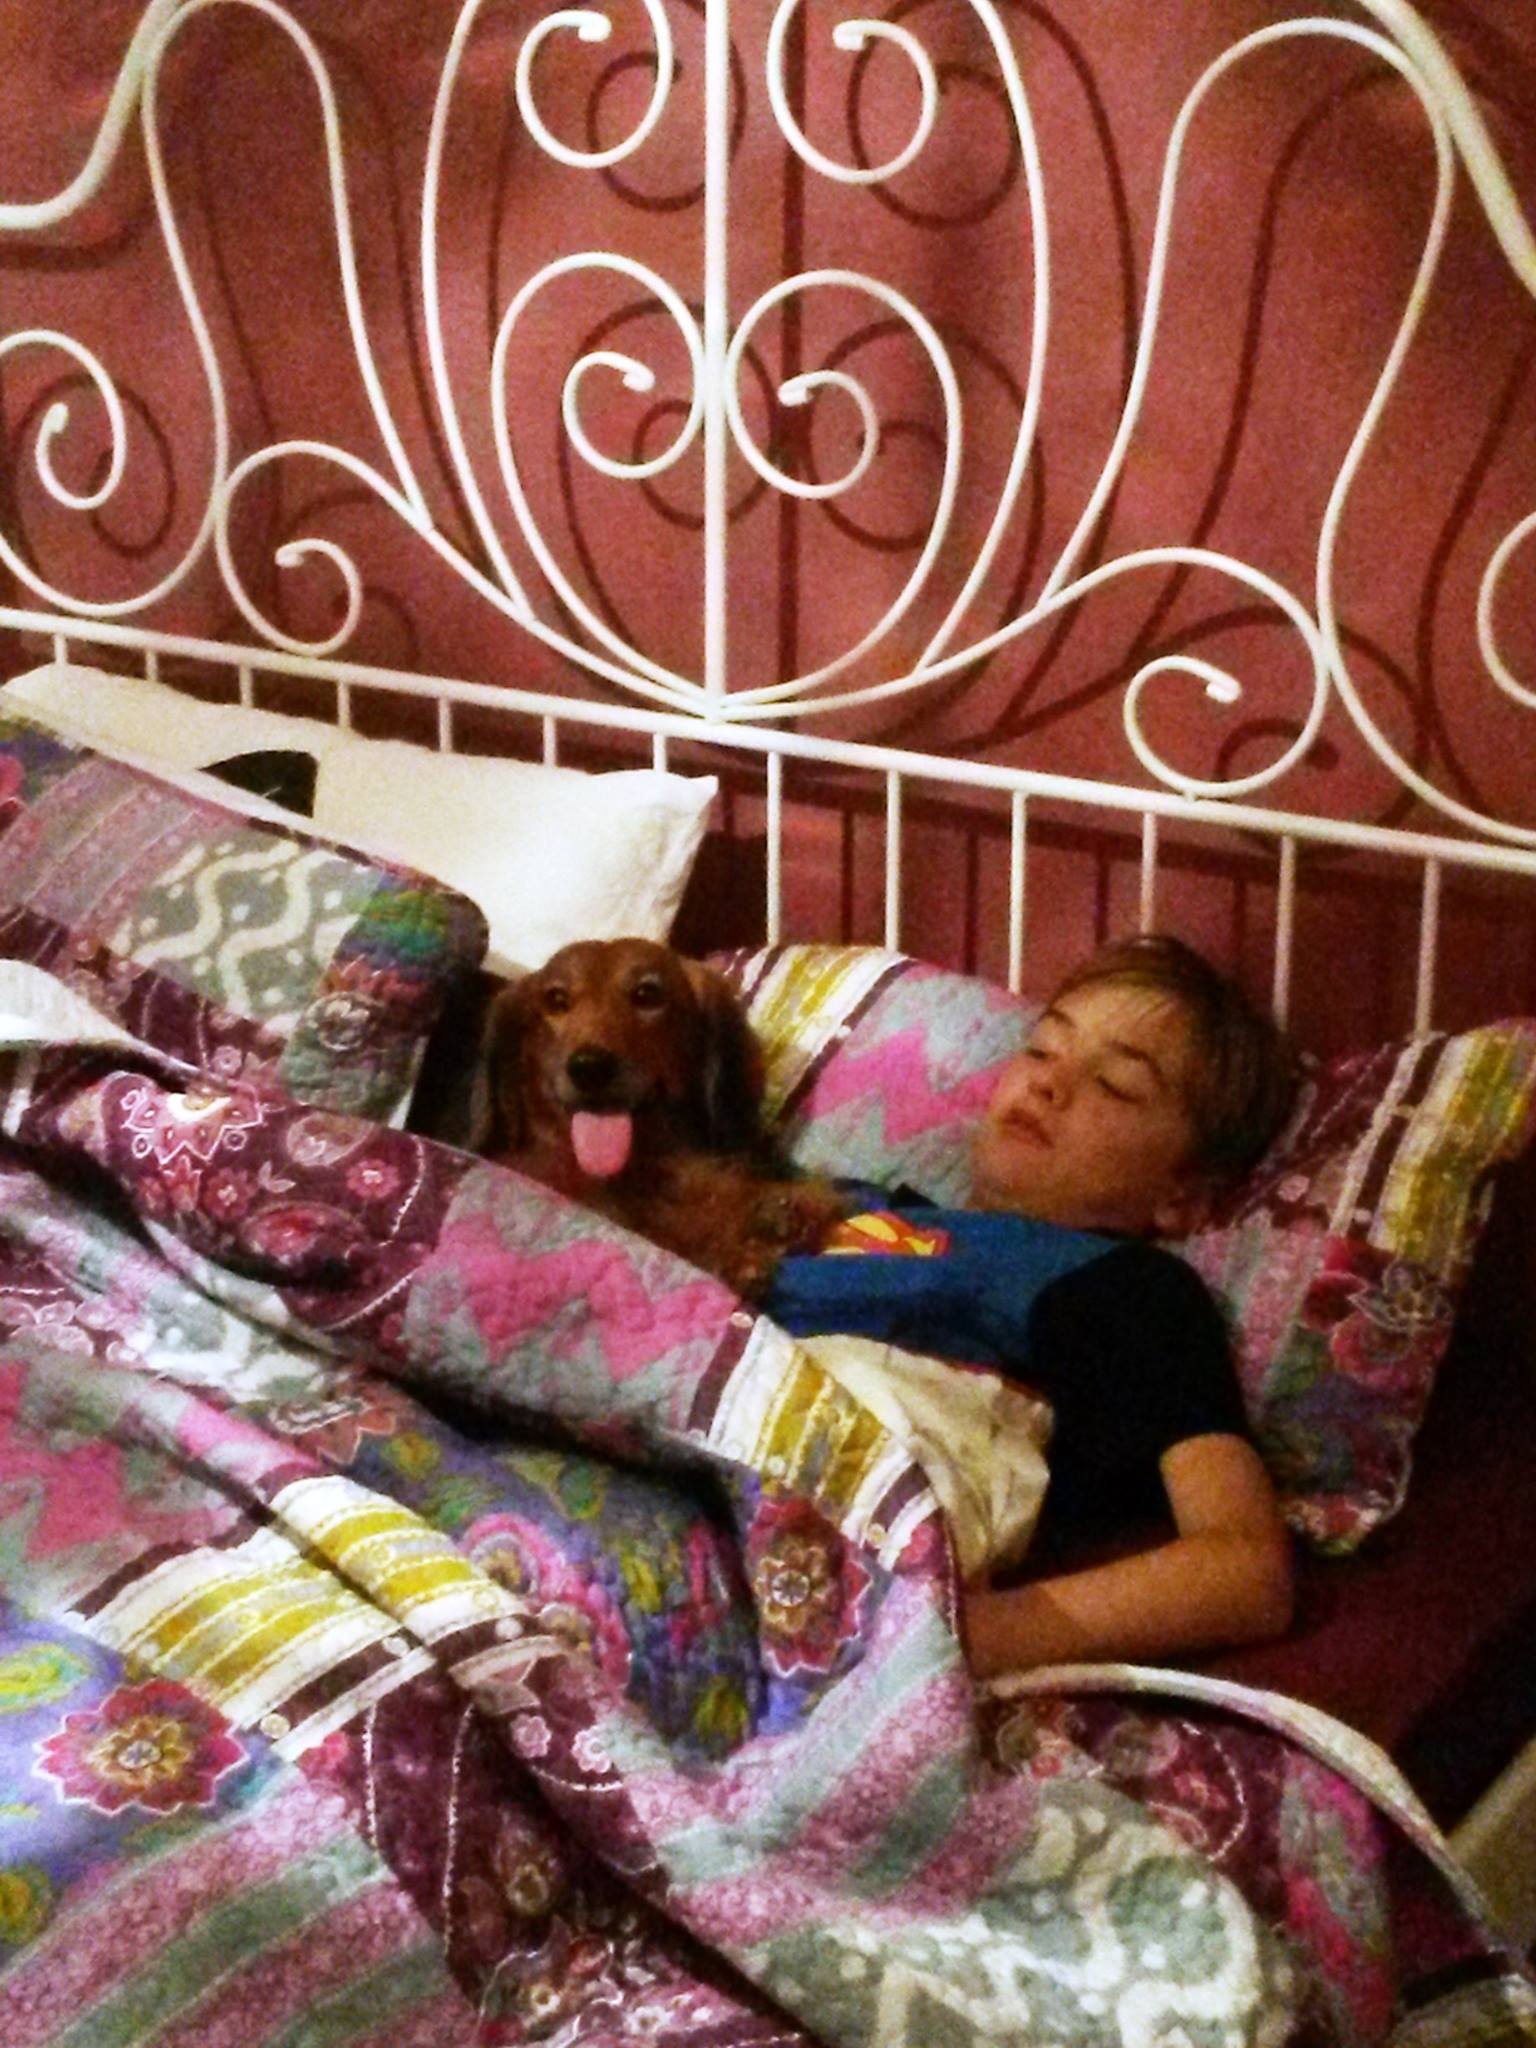 'Jimmy's' Bedtime!